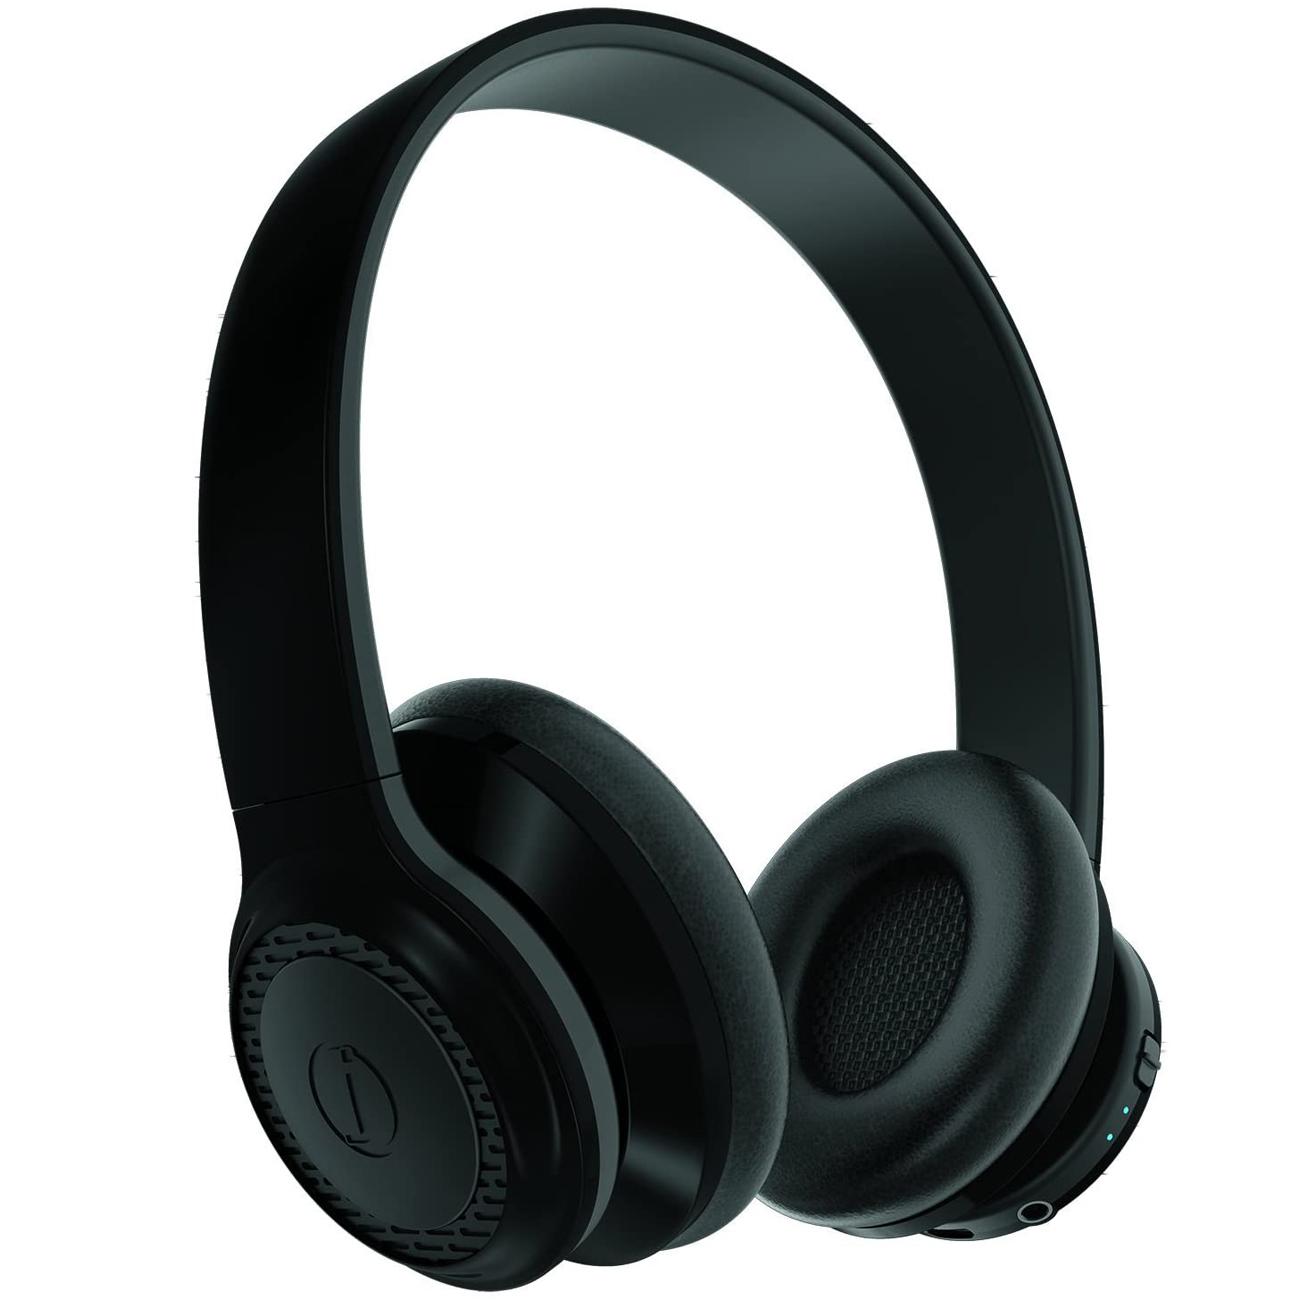 Headphone Bluetooth Fone de ouvido sem fio SilentPro Jam